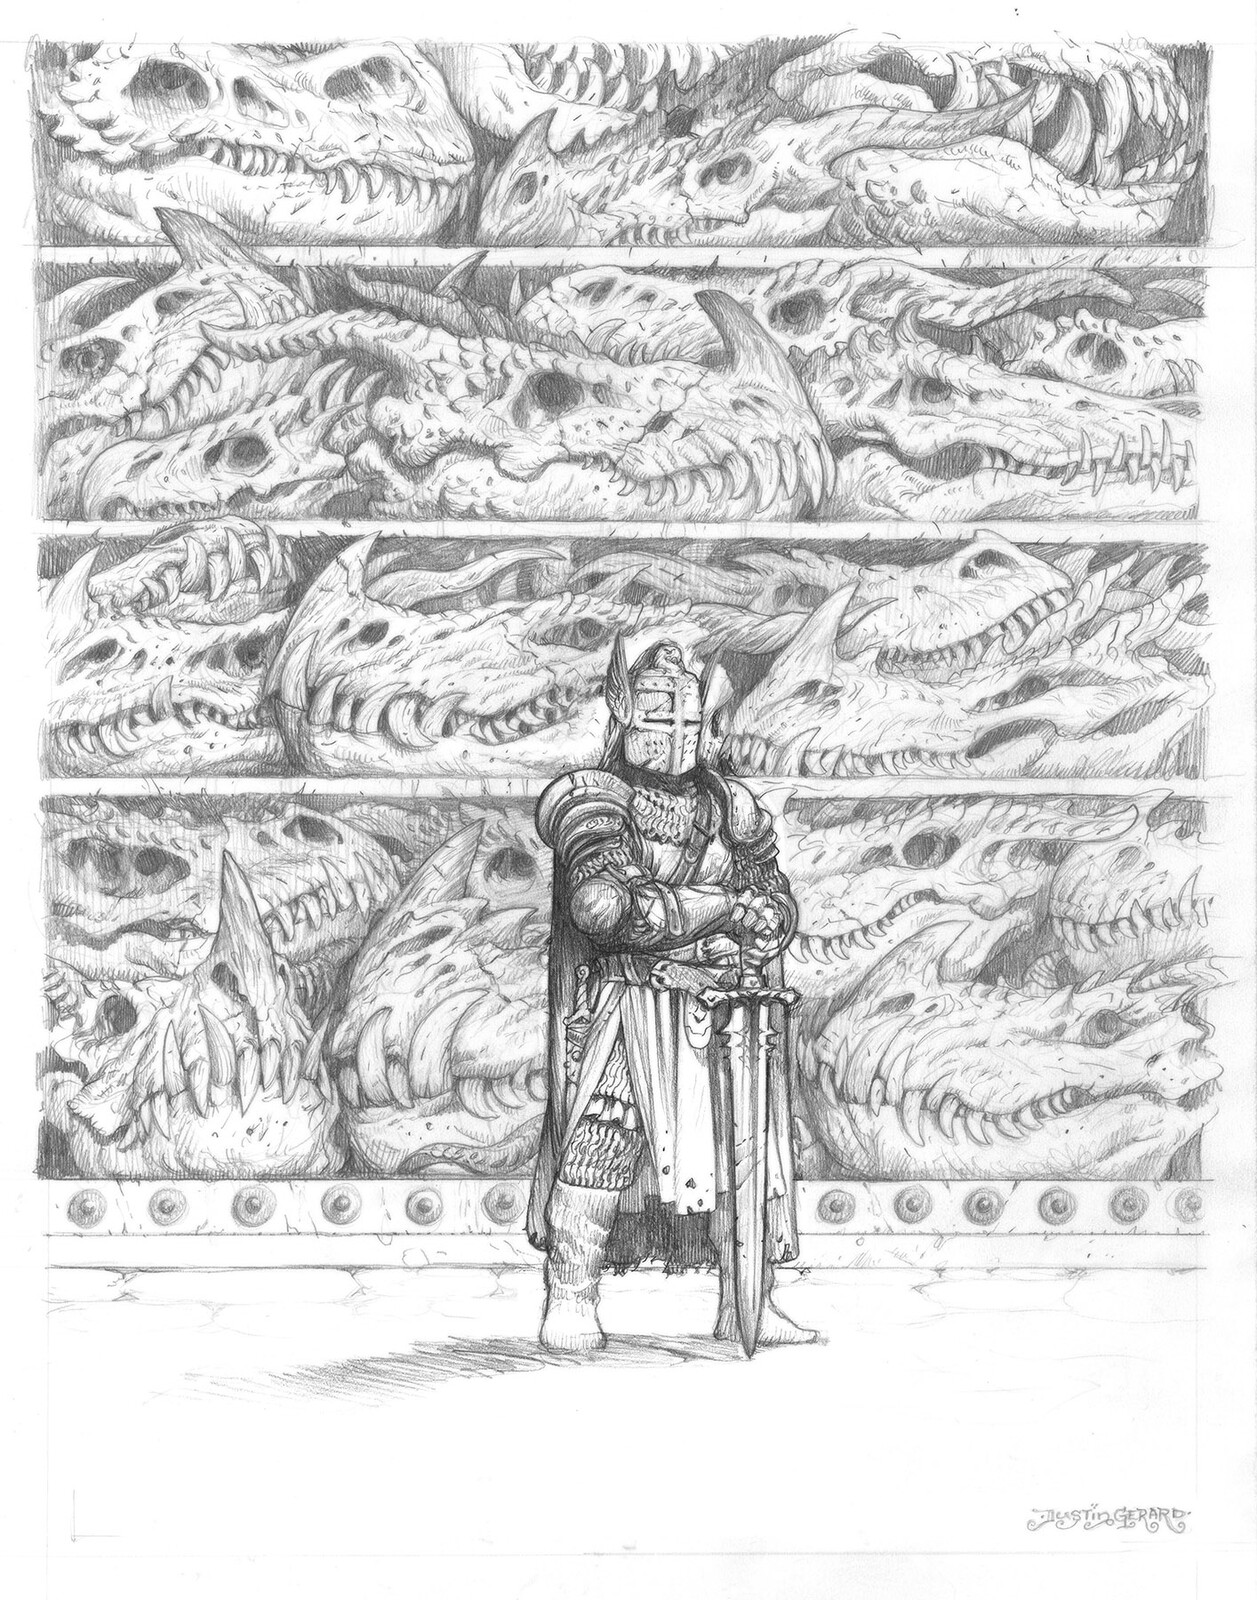 Original Drawing. 11x14, graphite on Strathmore bristol.